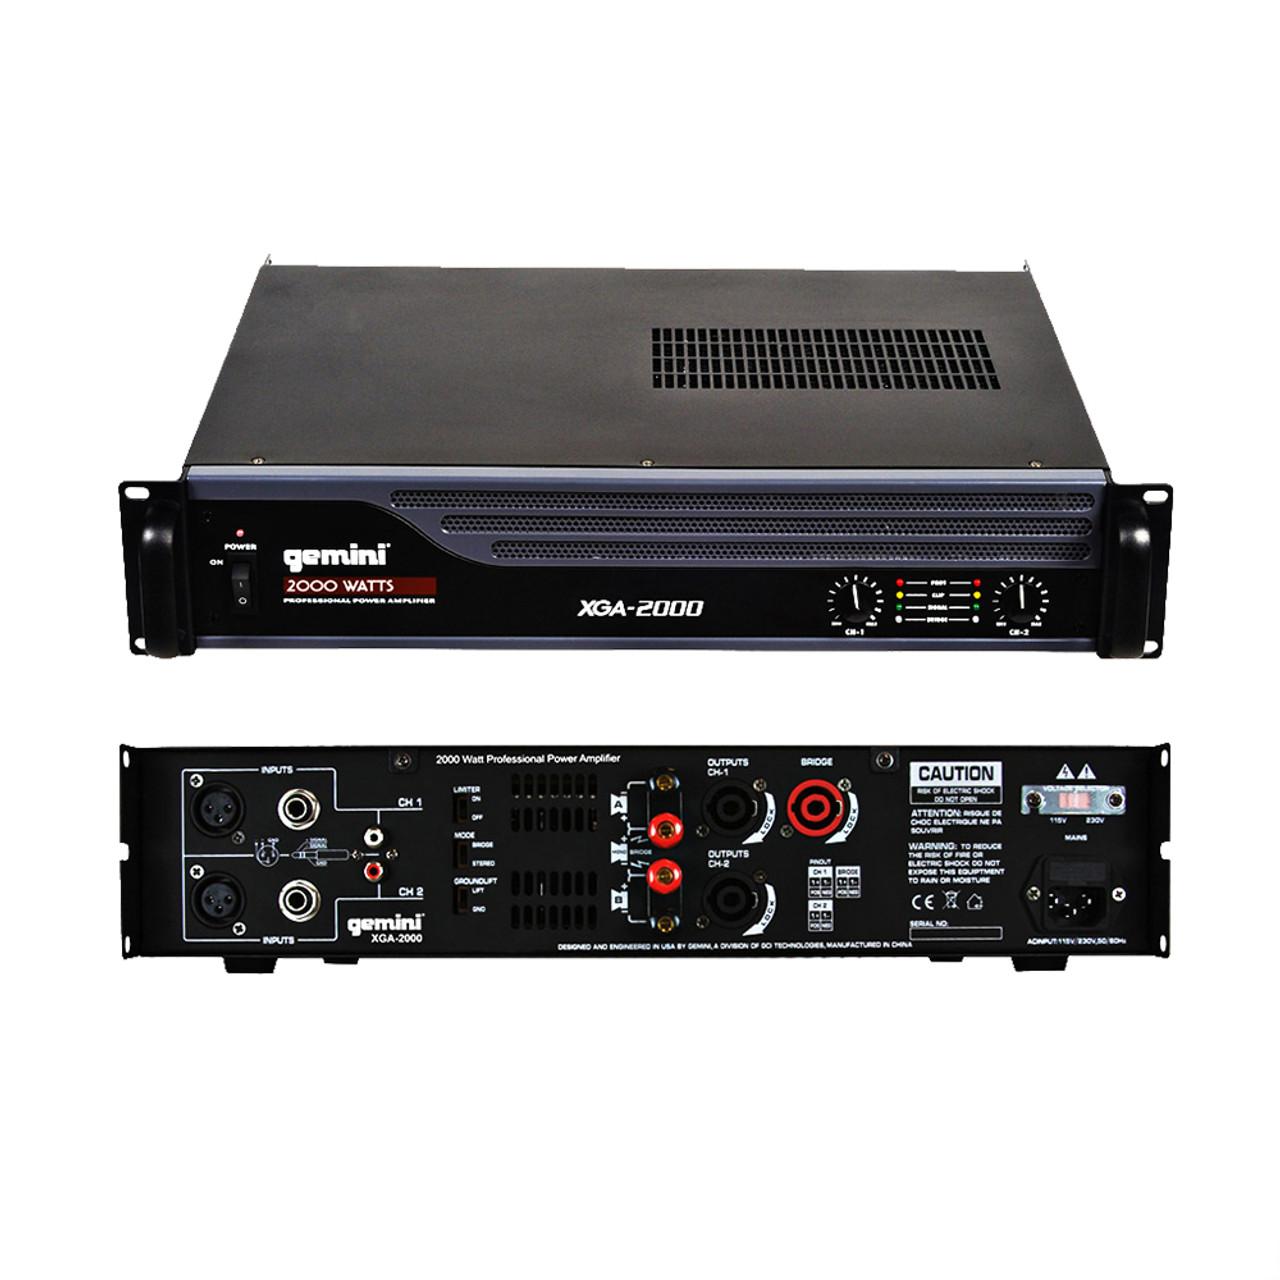 Gemini XGA Series XGA-2000 Professional Quality PA System DJ Equipment Power Amplifier with 2000 Watt Instant Peak Power